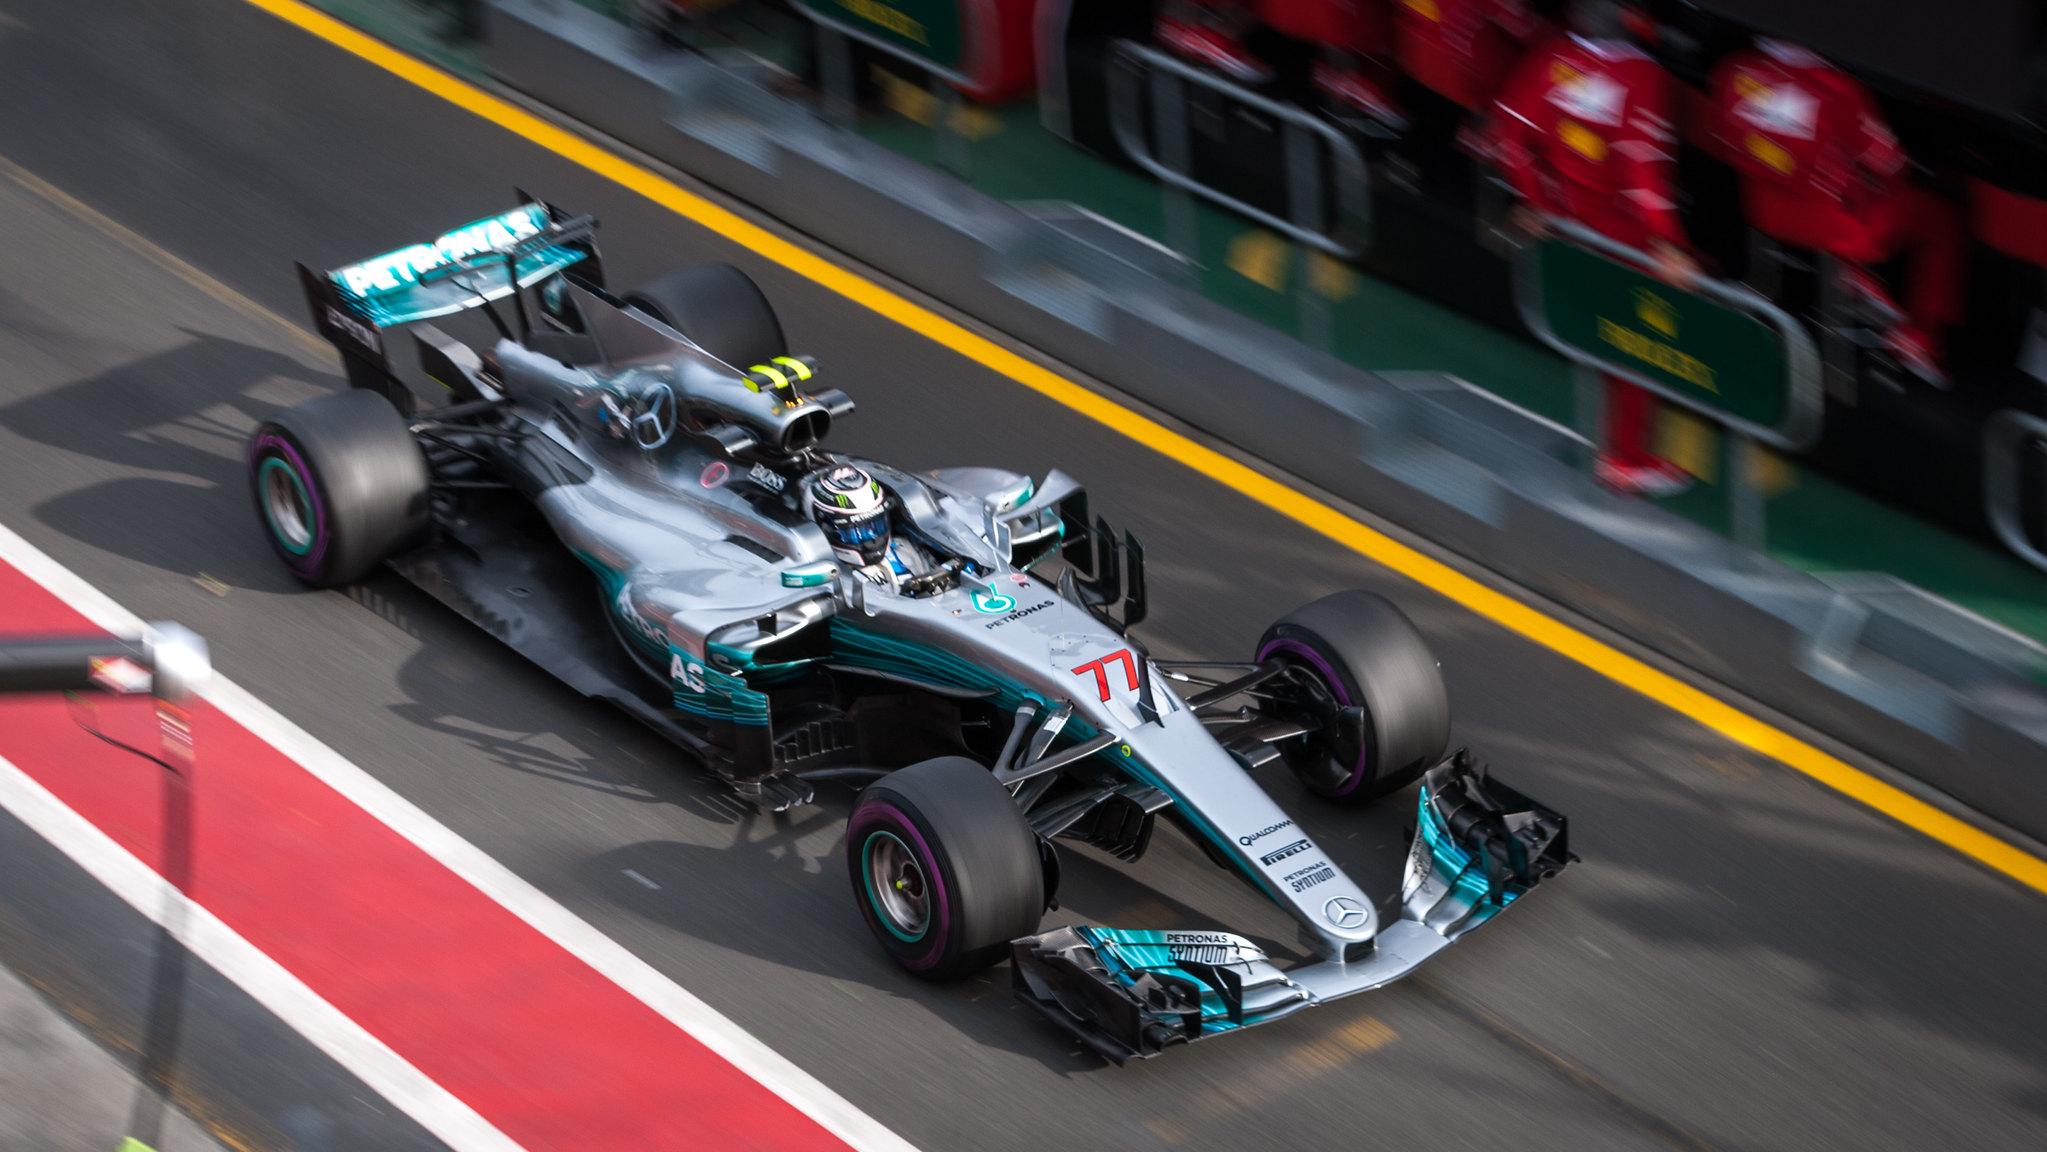 Equipes de F1 - Mercedes GP F1 - foto by Jake Archibald - Flickr